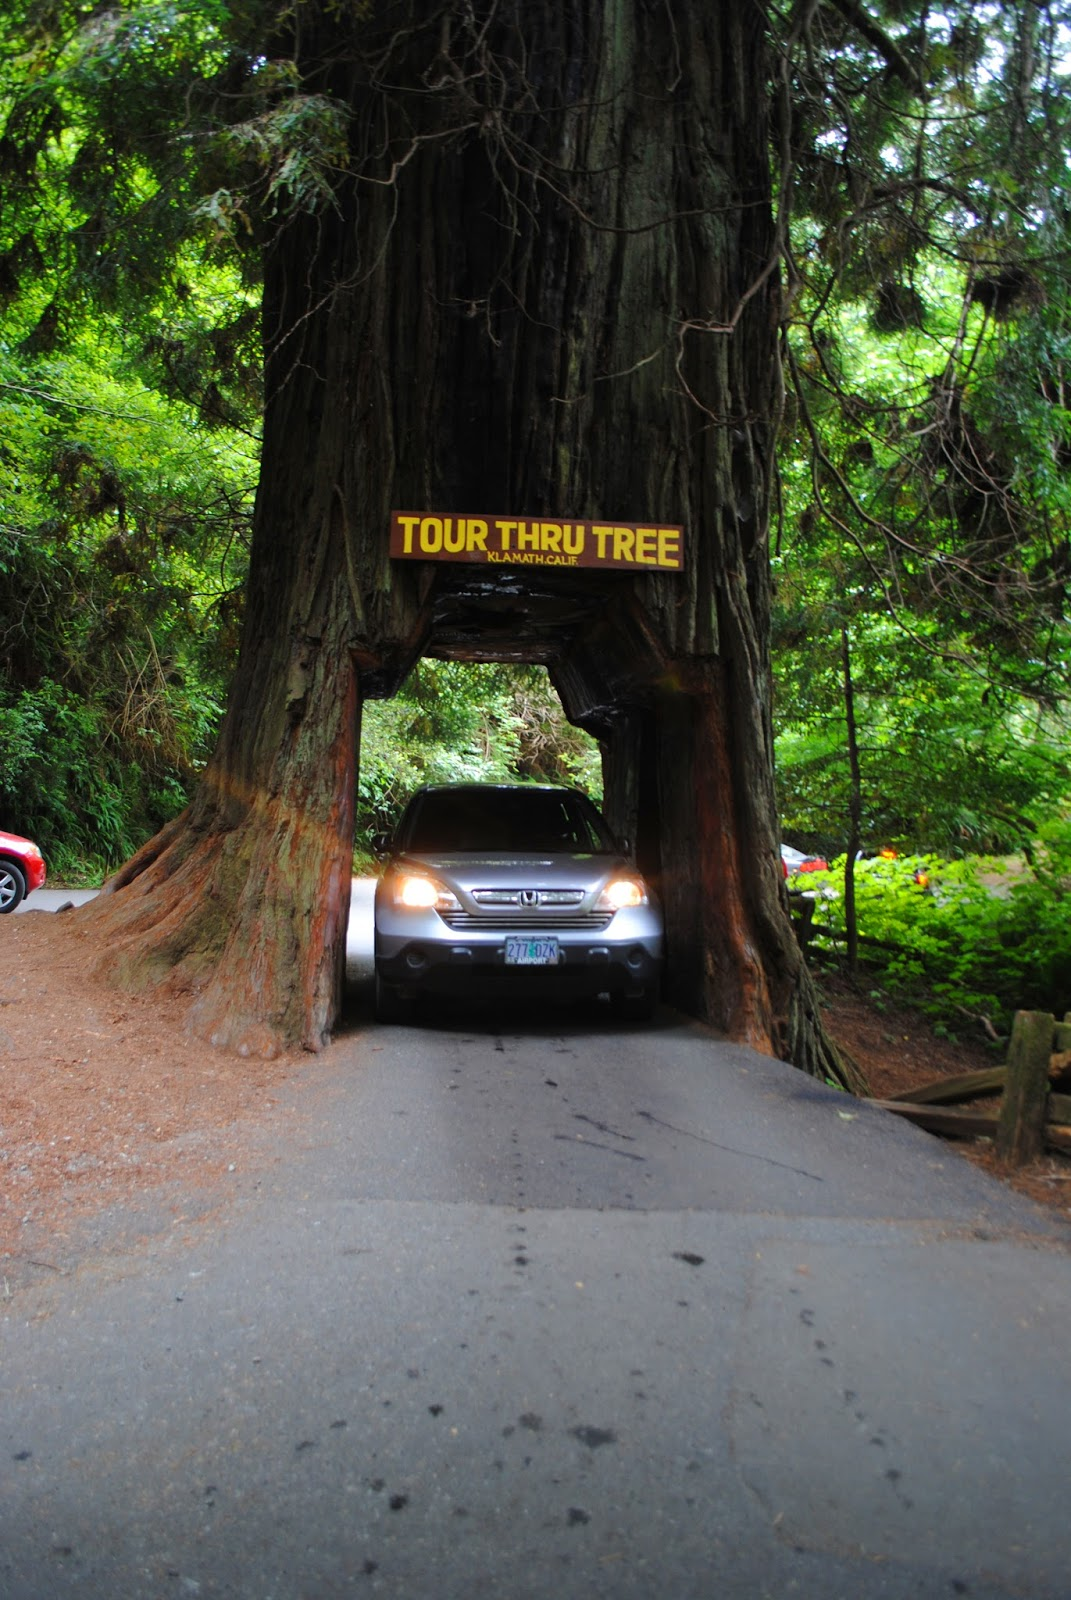 DRIVE-THRU REDWOOD TREE - Norhtern California - What to do in SOuthern ORegon - Camping - Kid-Friendly - Fun